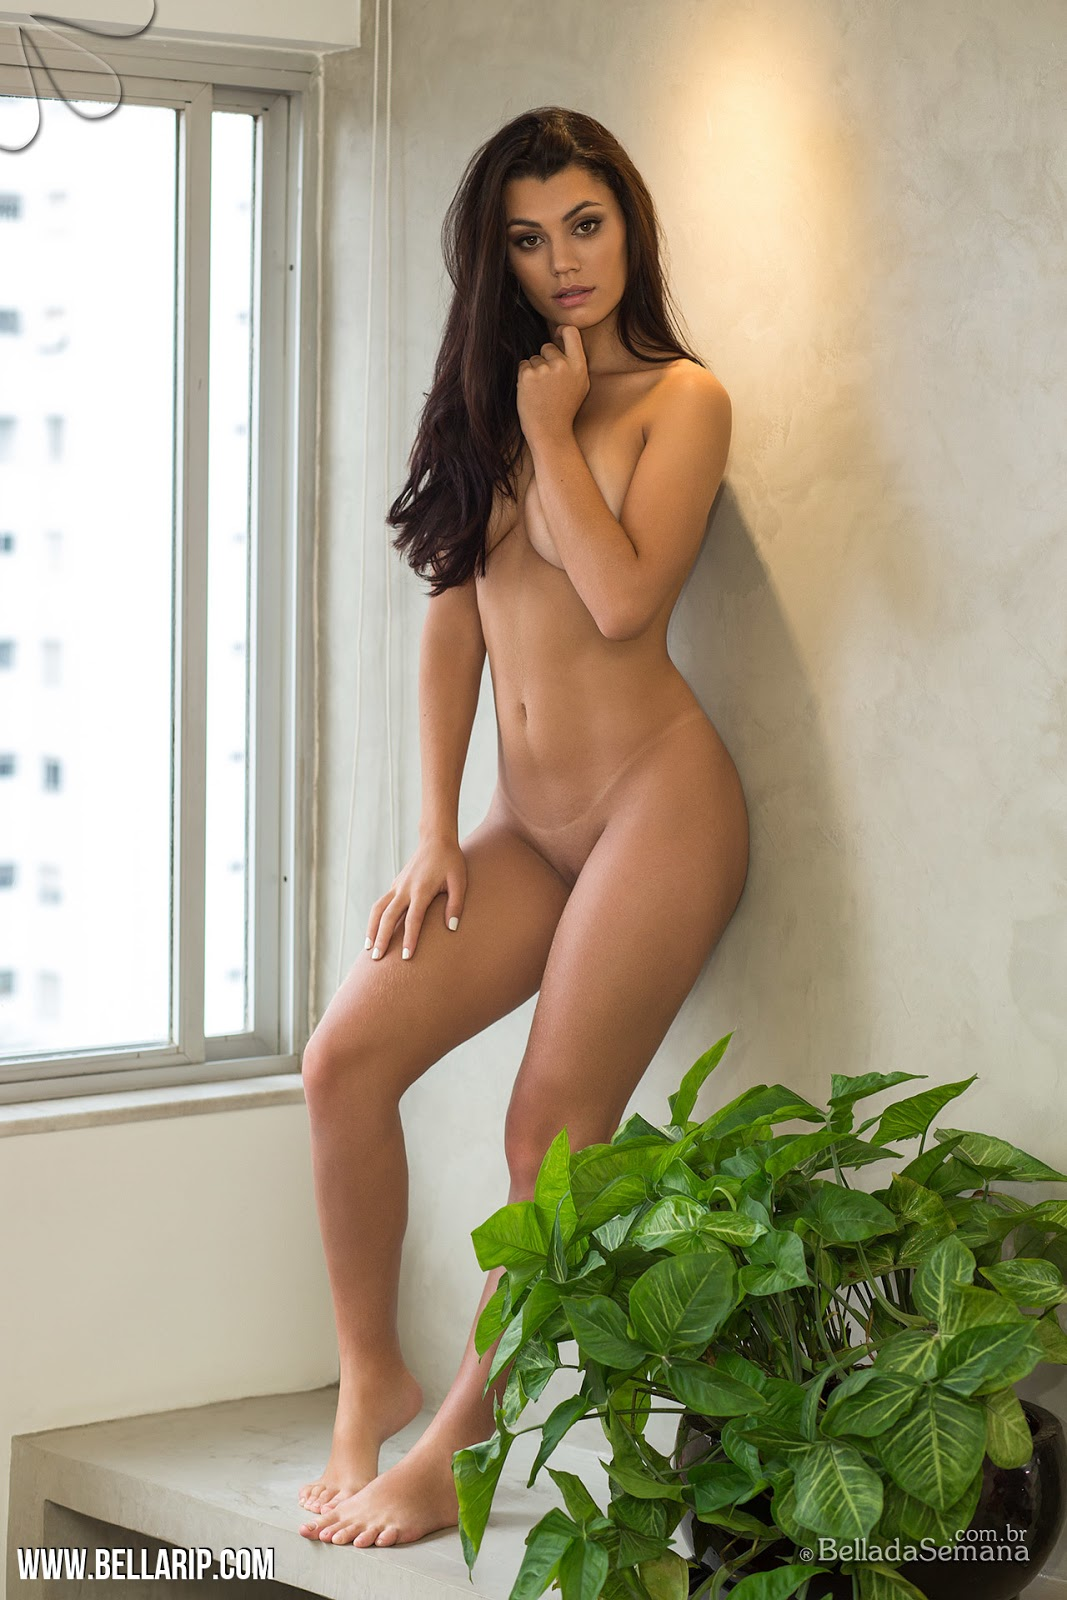 francielli-fontana-nude-brazilian-black-lingerie-camera-bellada-semana-17